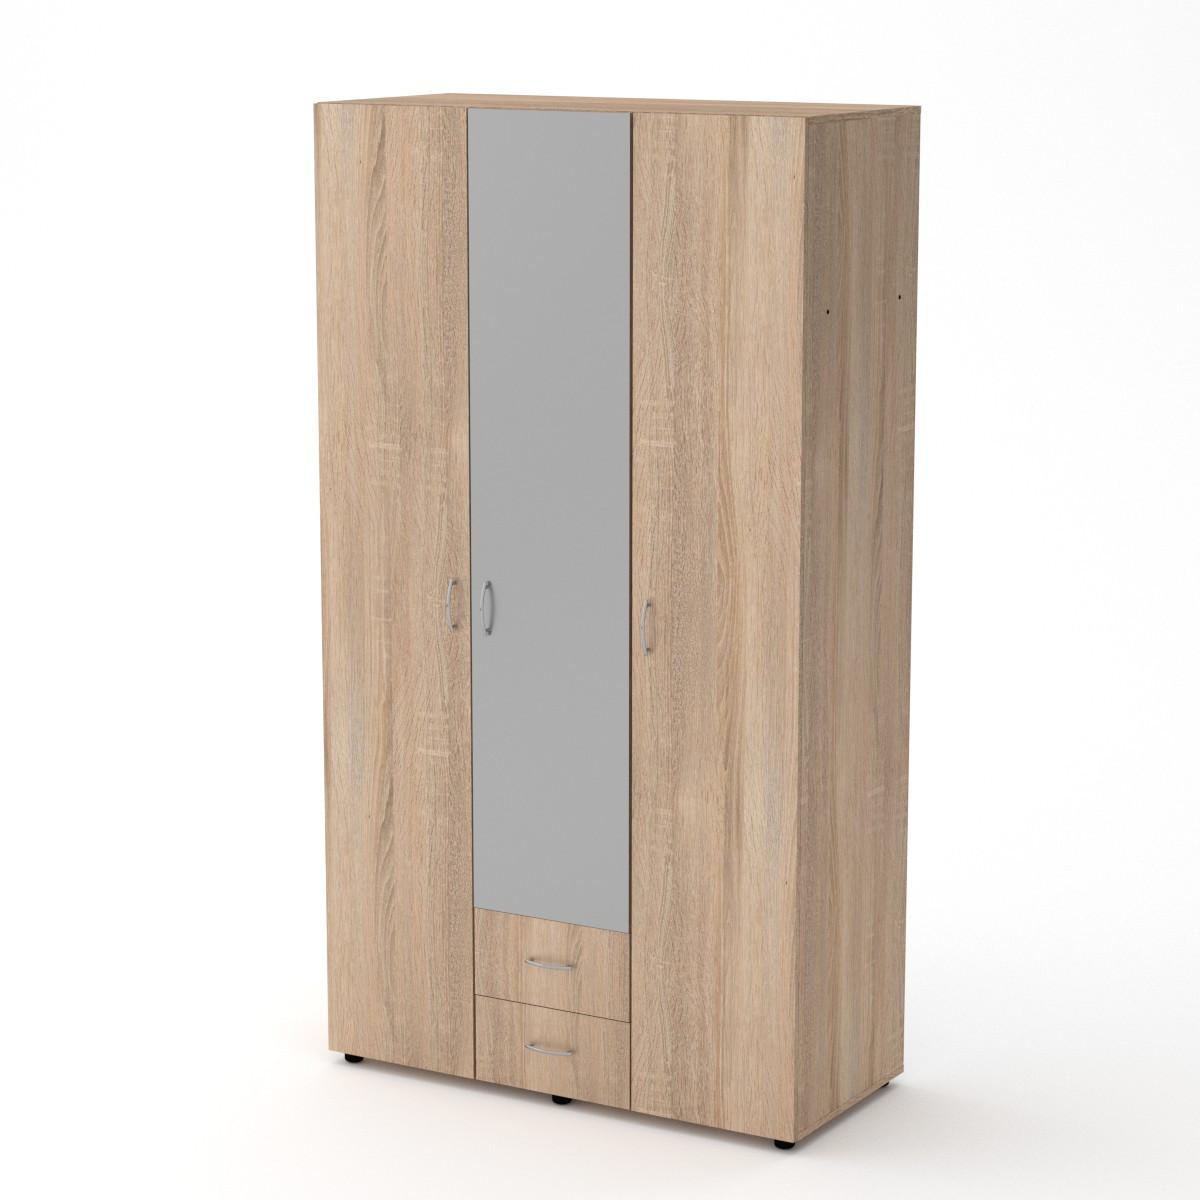 Шкаф-6 дуб сонома Компанит (120х54х218 см)